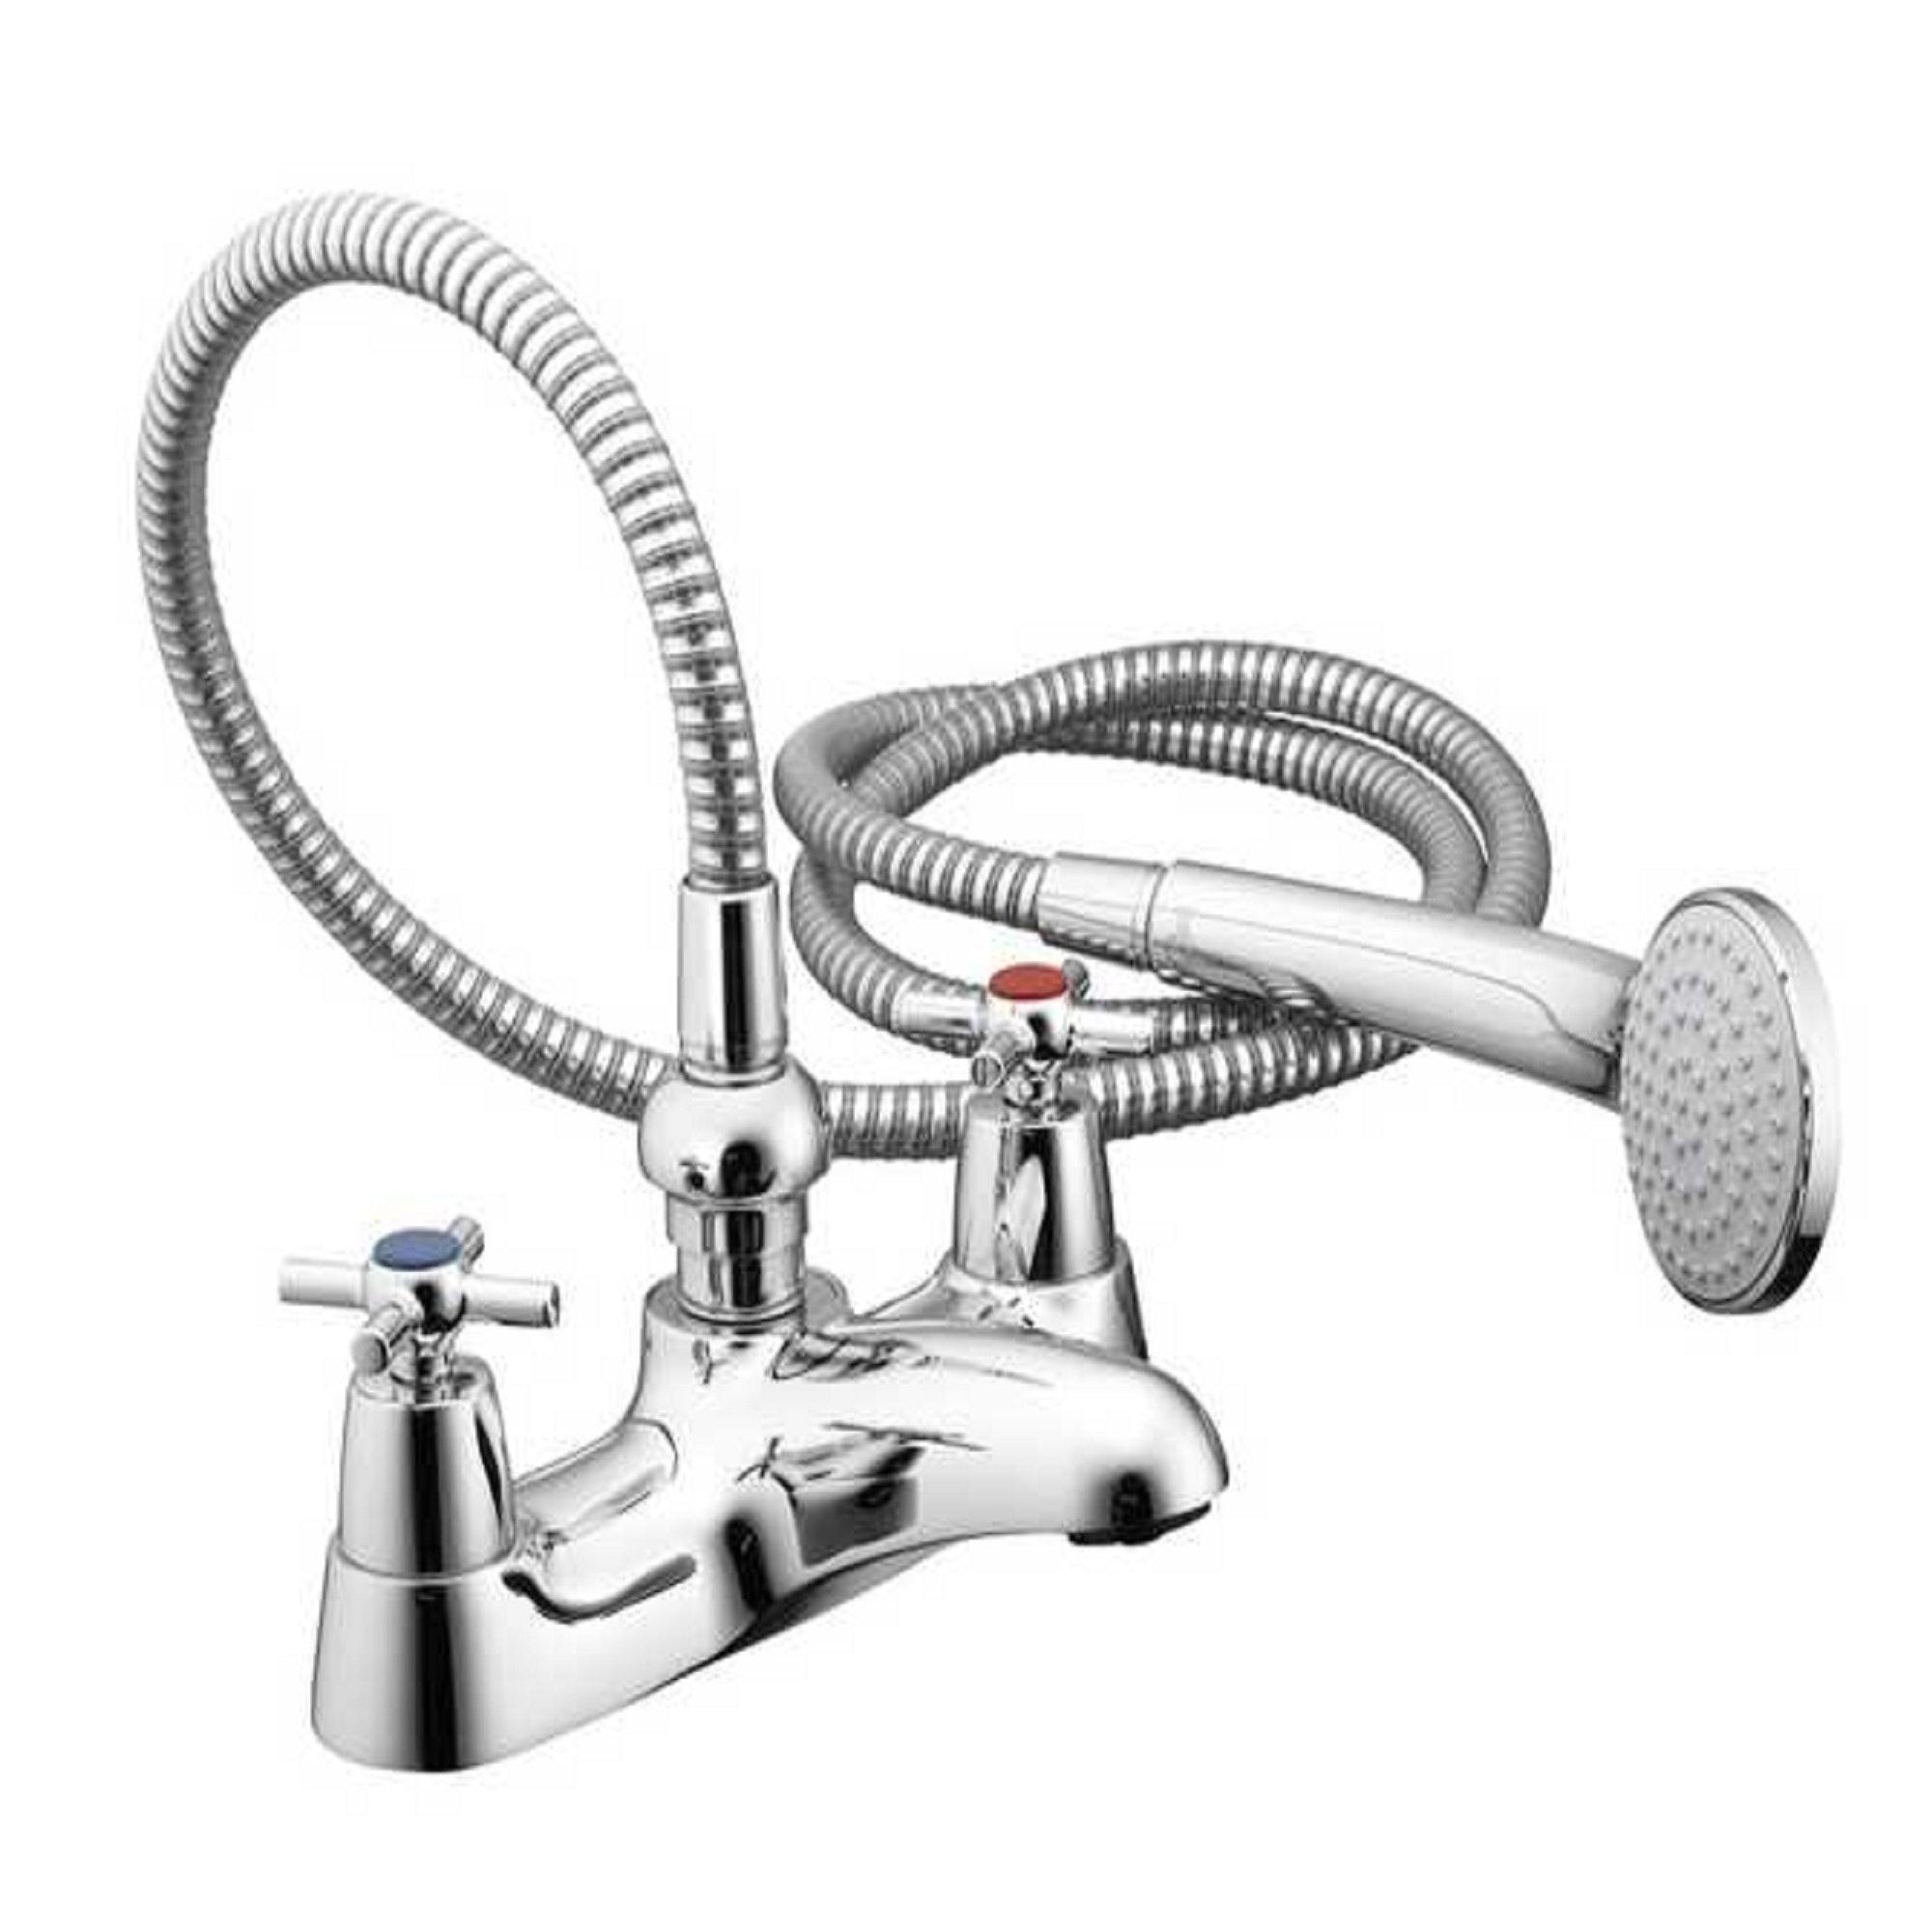 Shower Mixer Tap Market in 360MarketUpdates.com